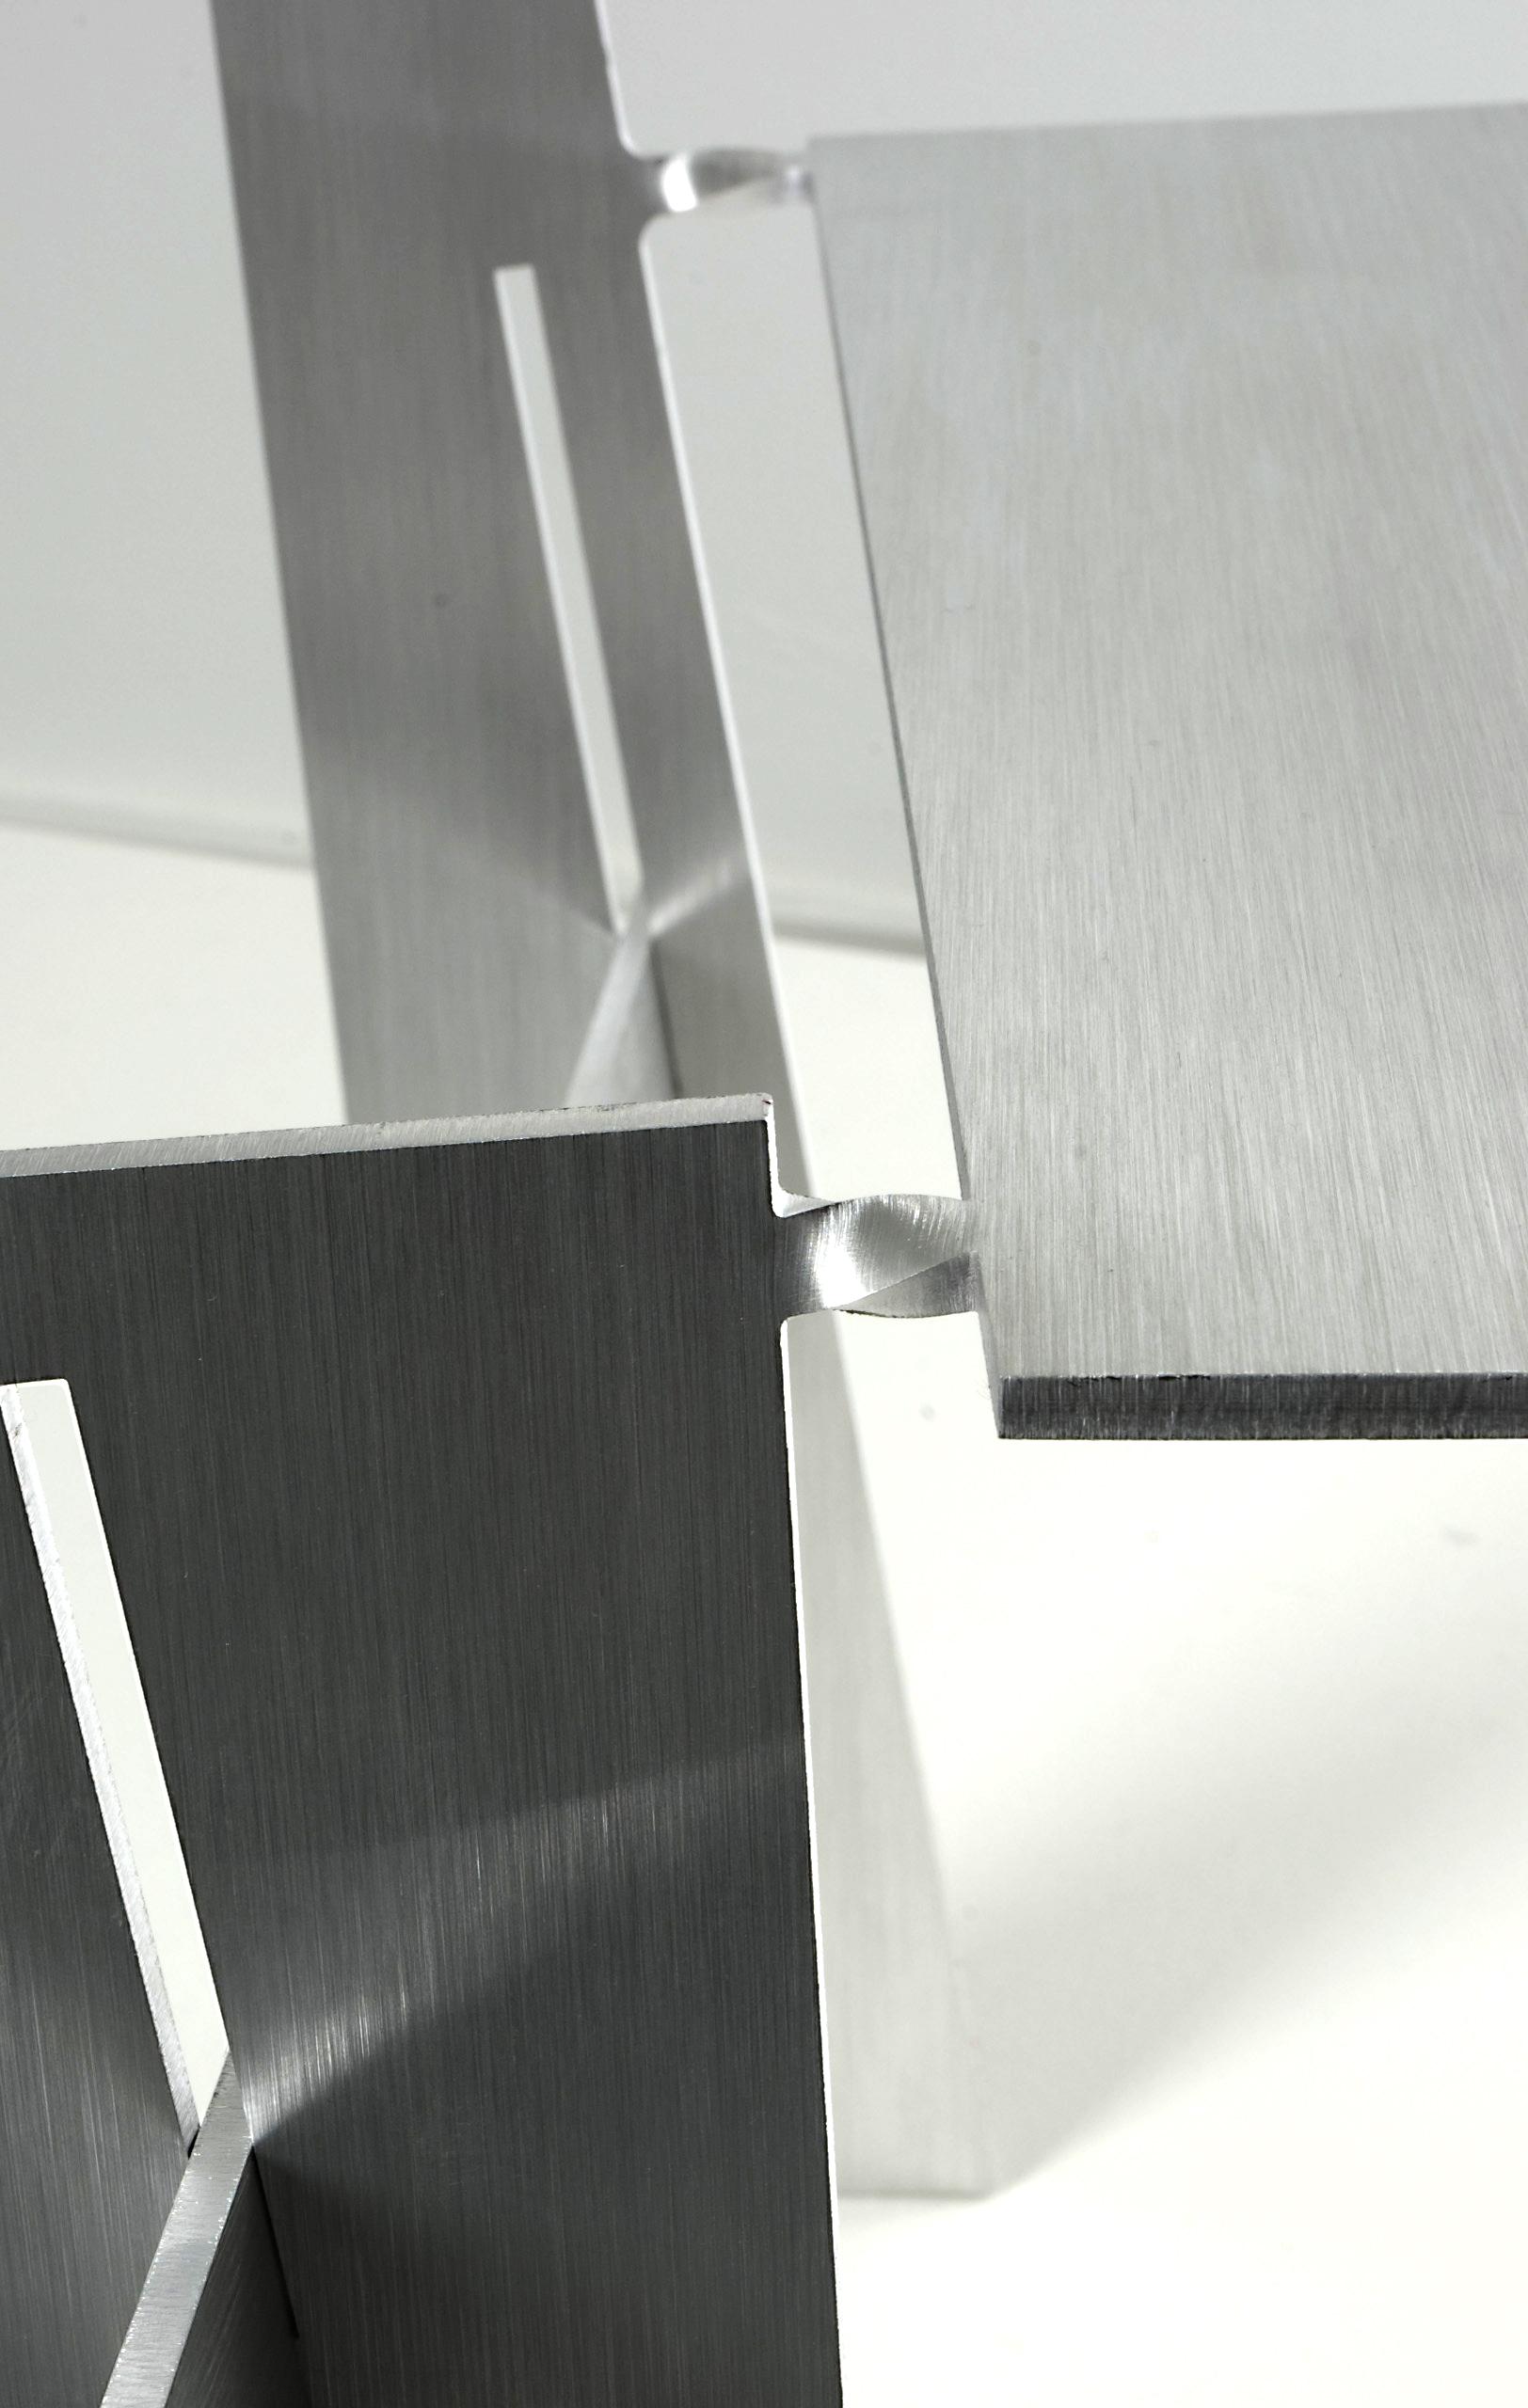 Kadushin-Vague Chair 3.jpg